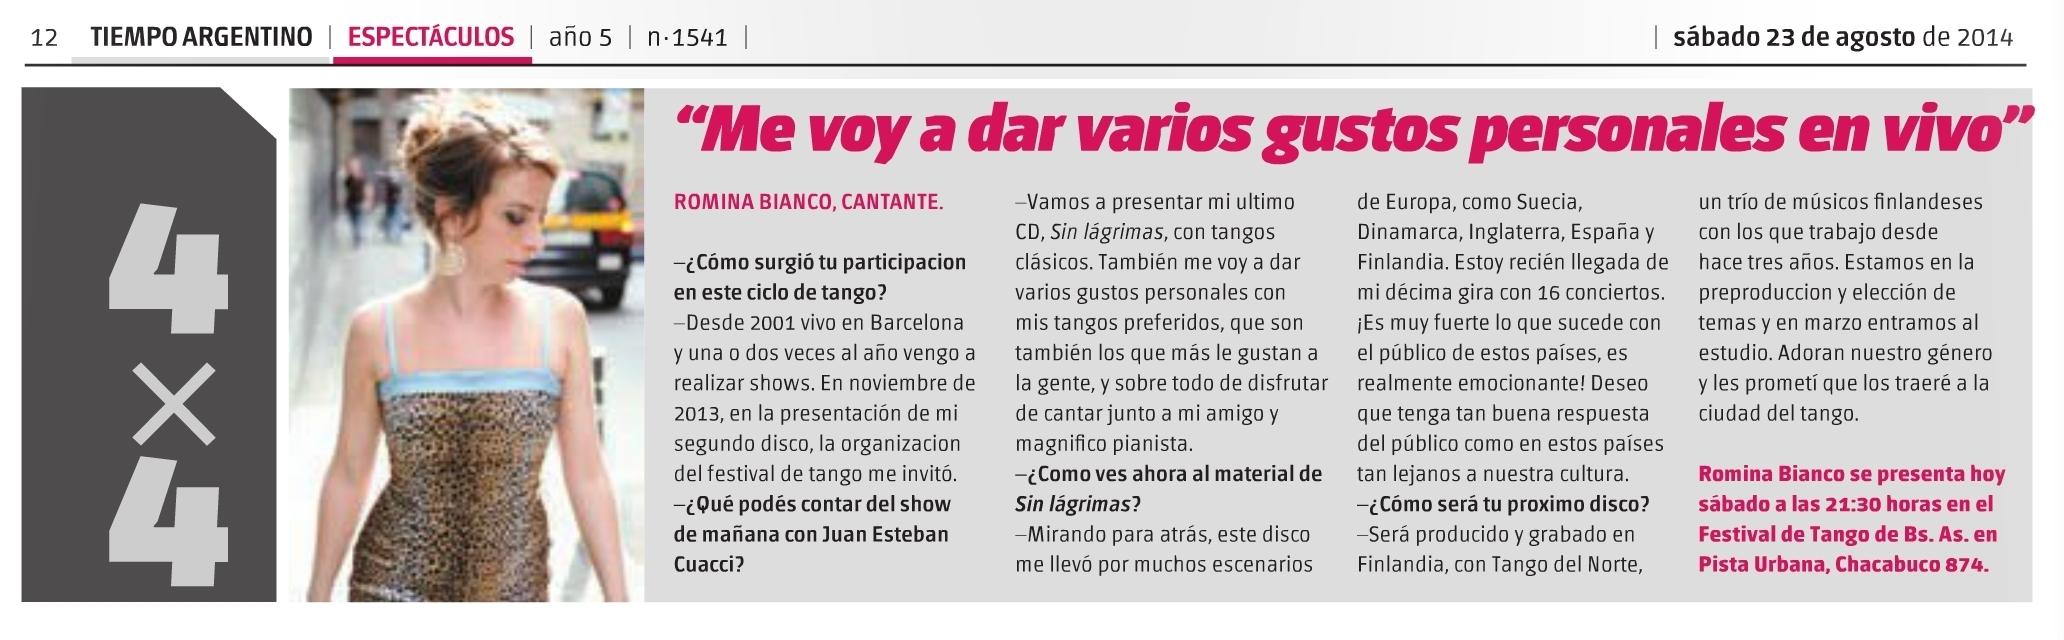 Argentinian press BA Tango festival